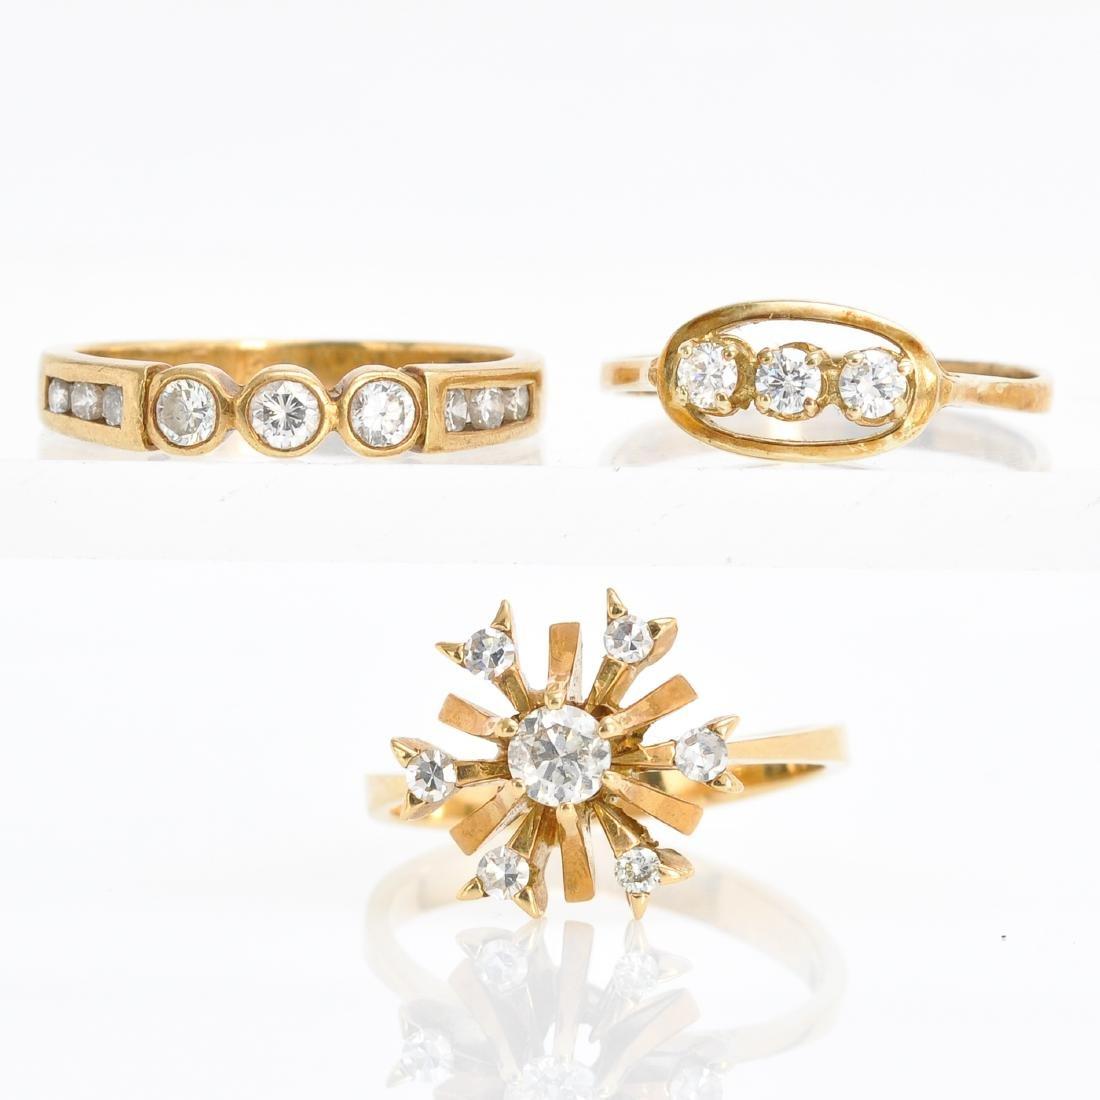 Three Ladies Diamond Rings